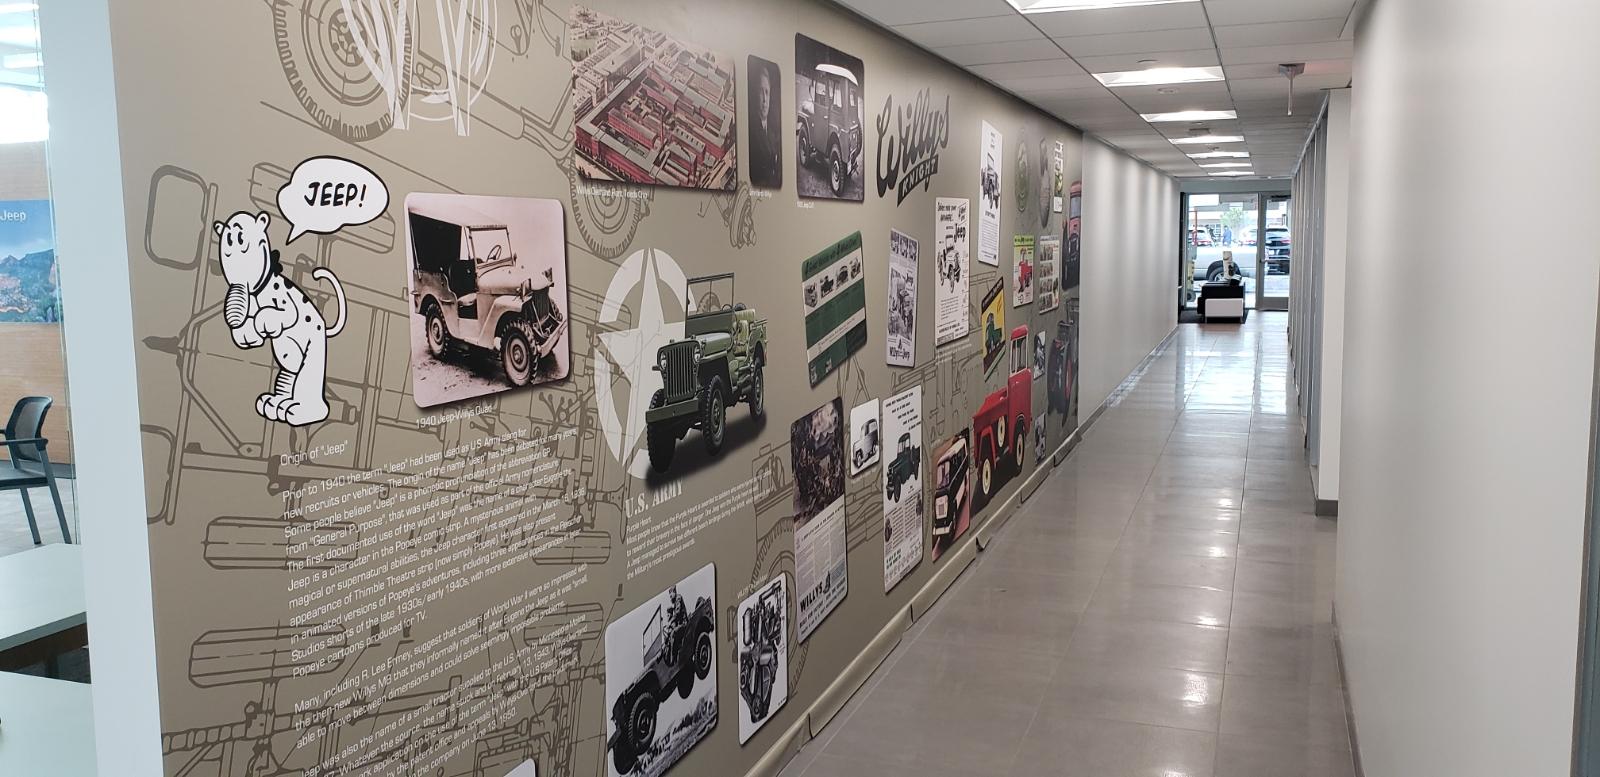 FI Hallway - JEEP Story Wall Paper Graphic Progress.jpeg